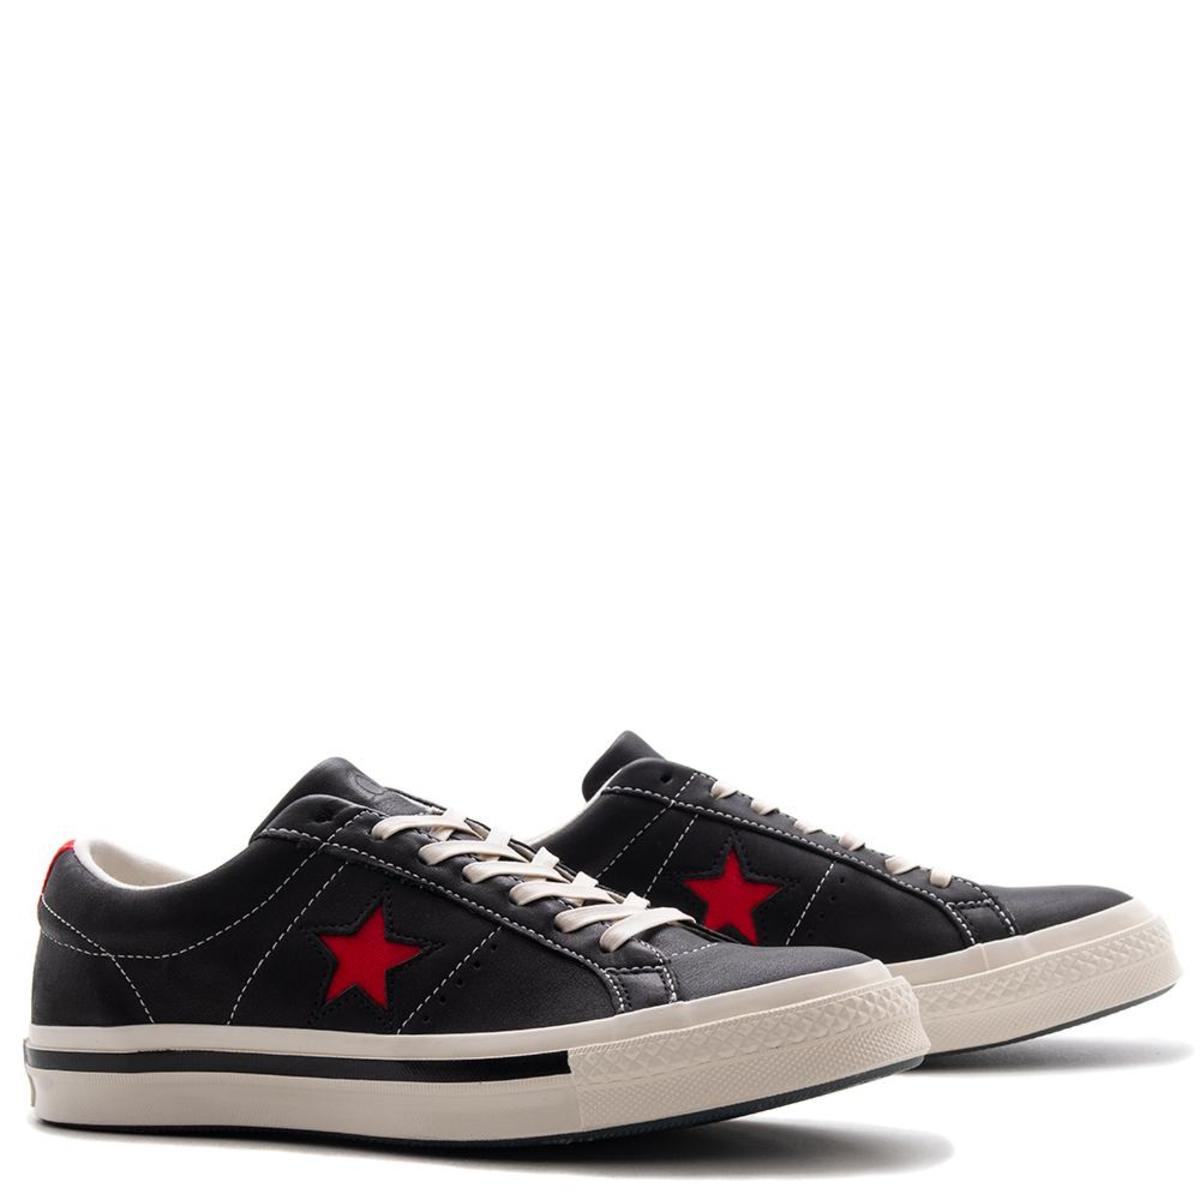 6d878a1feabb Converse Incubate x Kasina One Star Ox   Black